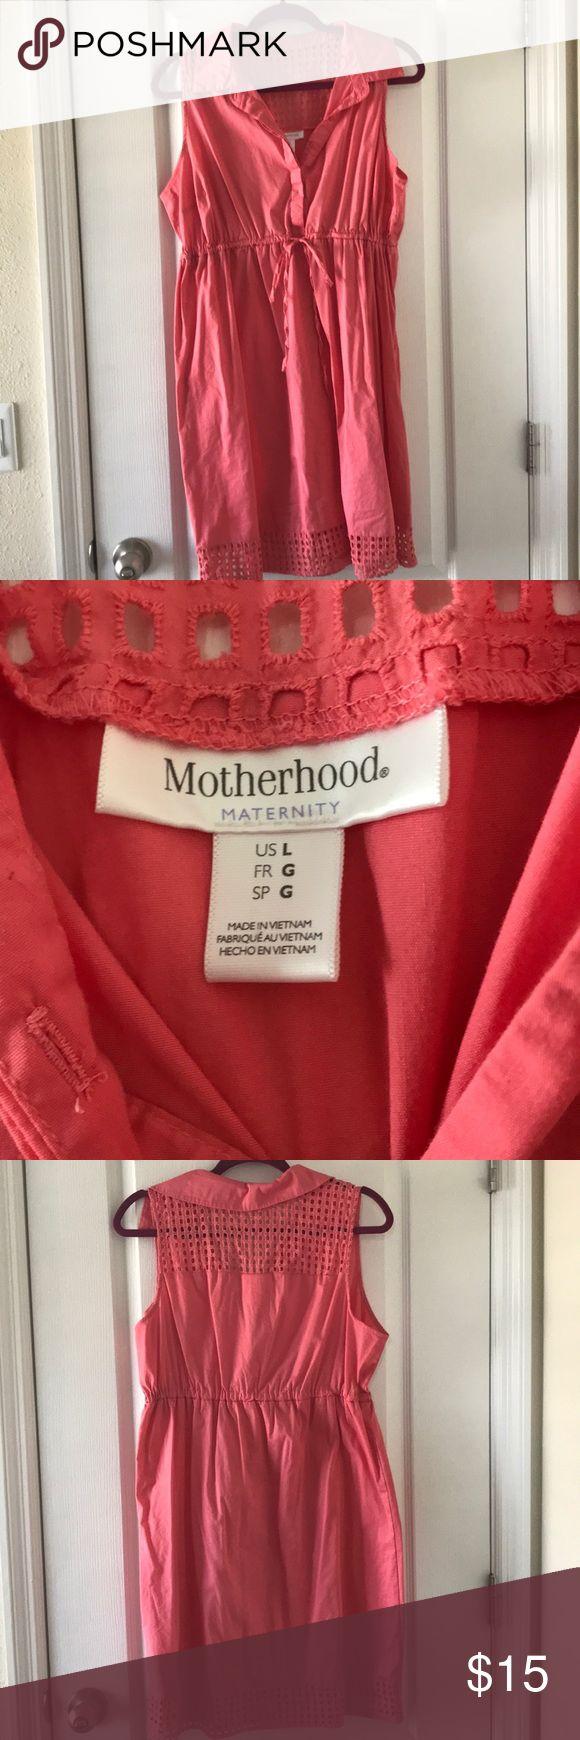 Motherhood coral sundress - size Large Adorable Motherhood Coral Sundress - Never Worn - Size Large Motherhood Maternity Dresses Midi